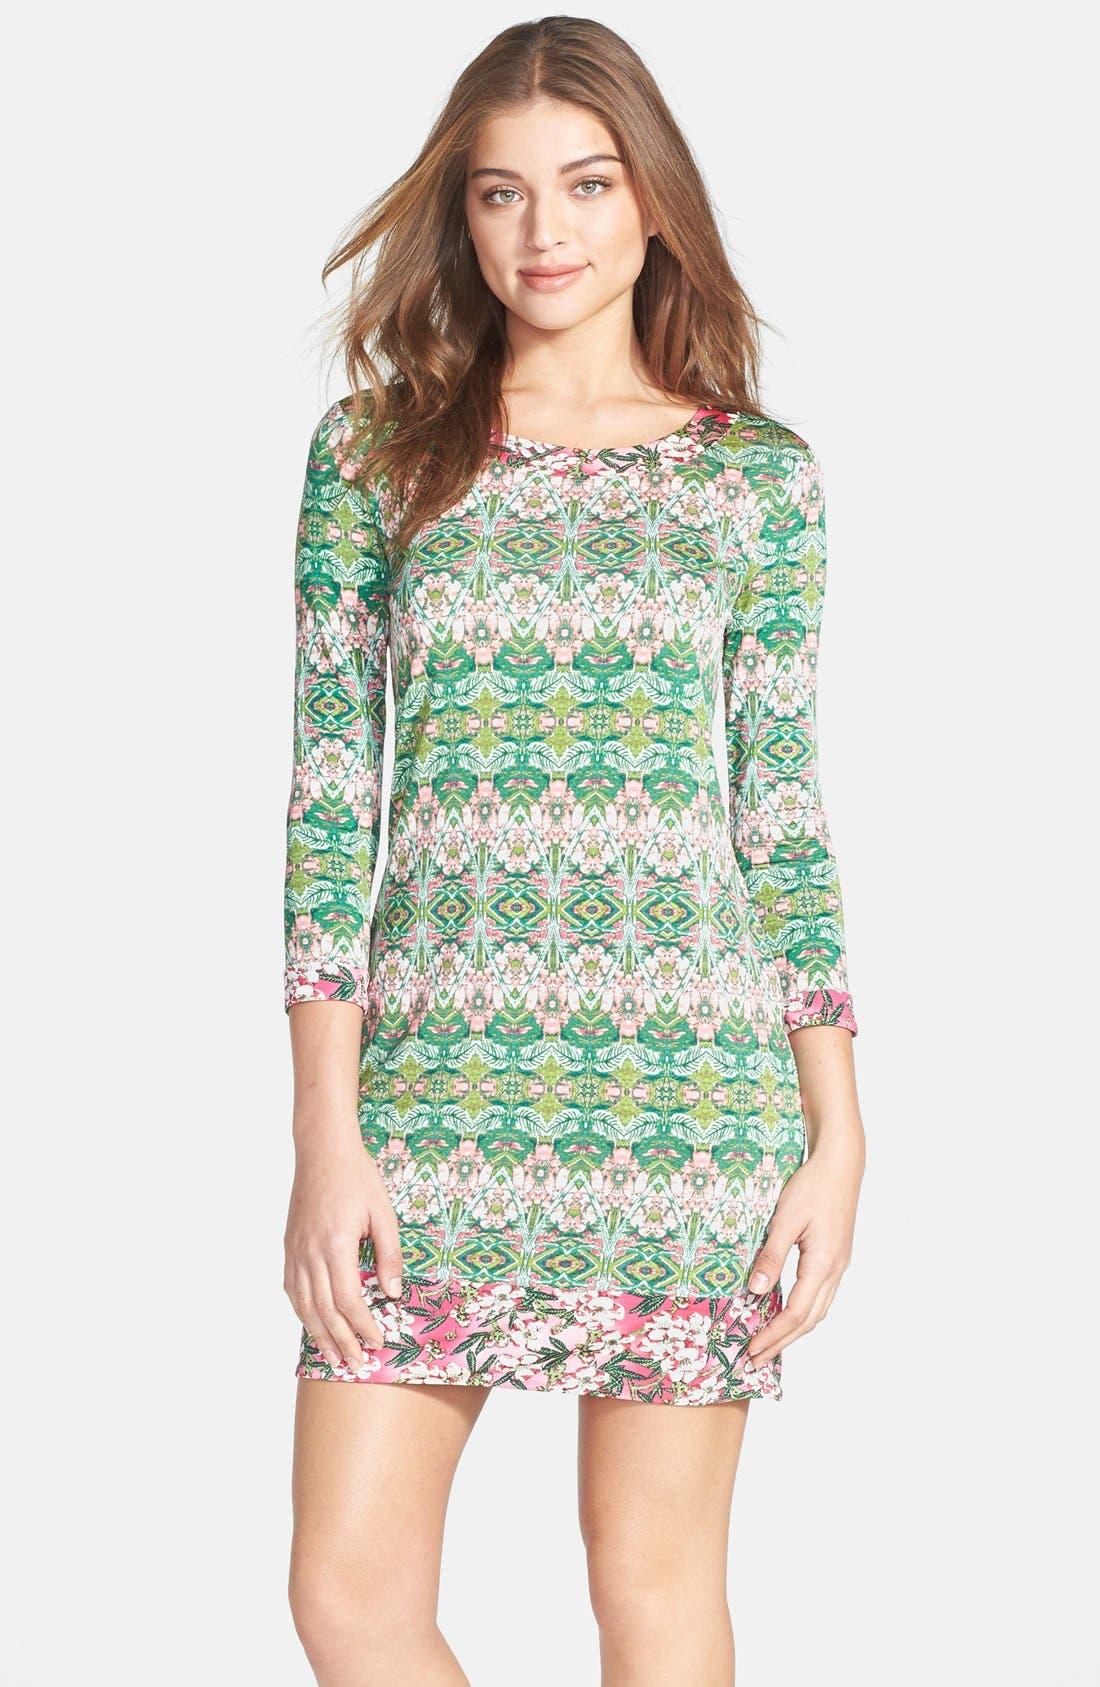 Alternate Image 1 Selected - BCBGMAXAZRIA 'Ania' Print Jersey Shift Dress